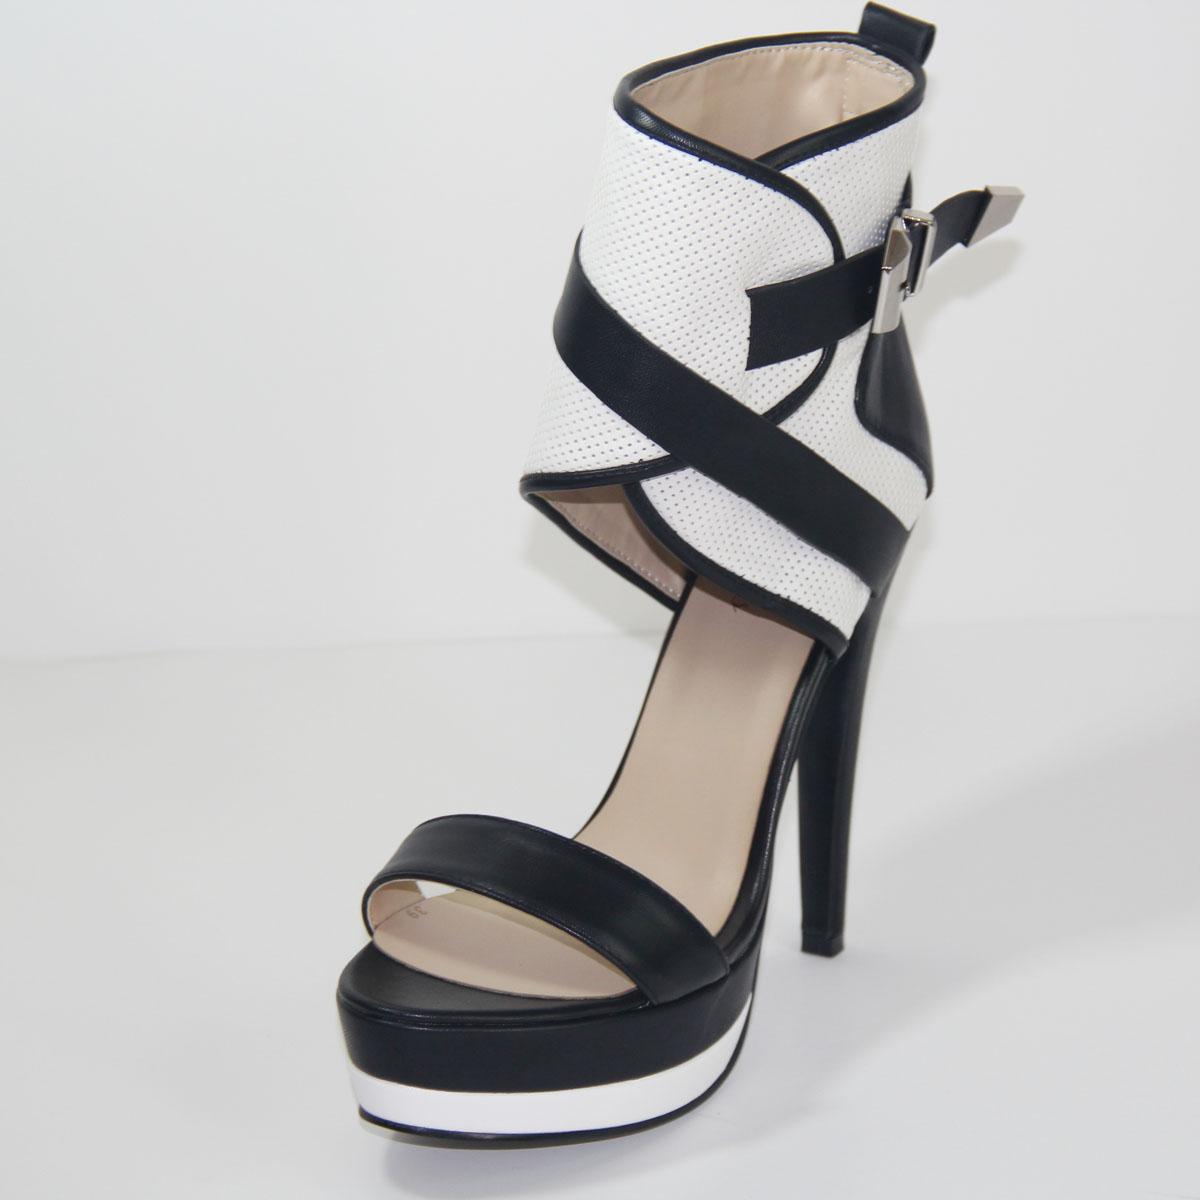 Zapatos Zapato Comercio Exterior black De White Del Moda Las Grande Talón And tartrazine Alto Mujeres Sandalias Sexy Punto Black PwXIqxn5